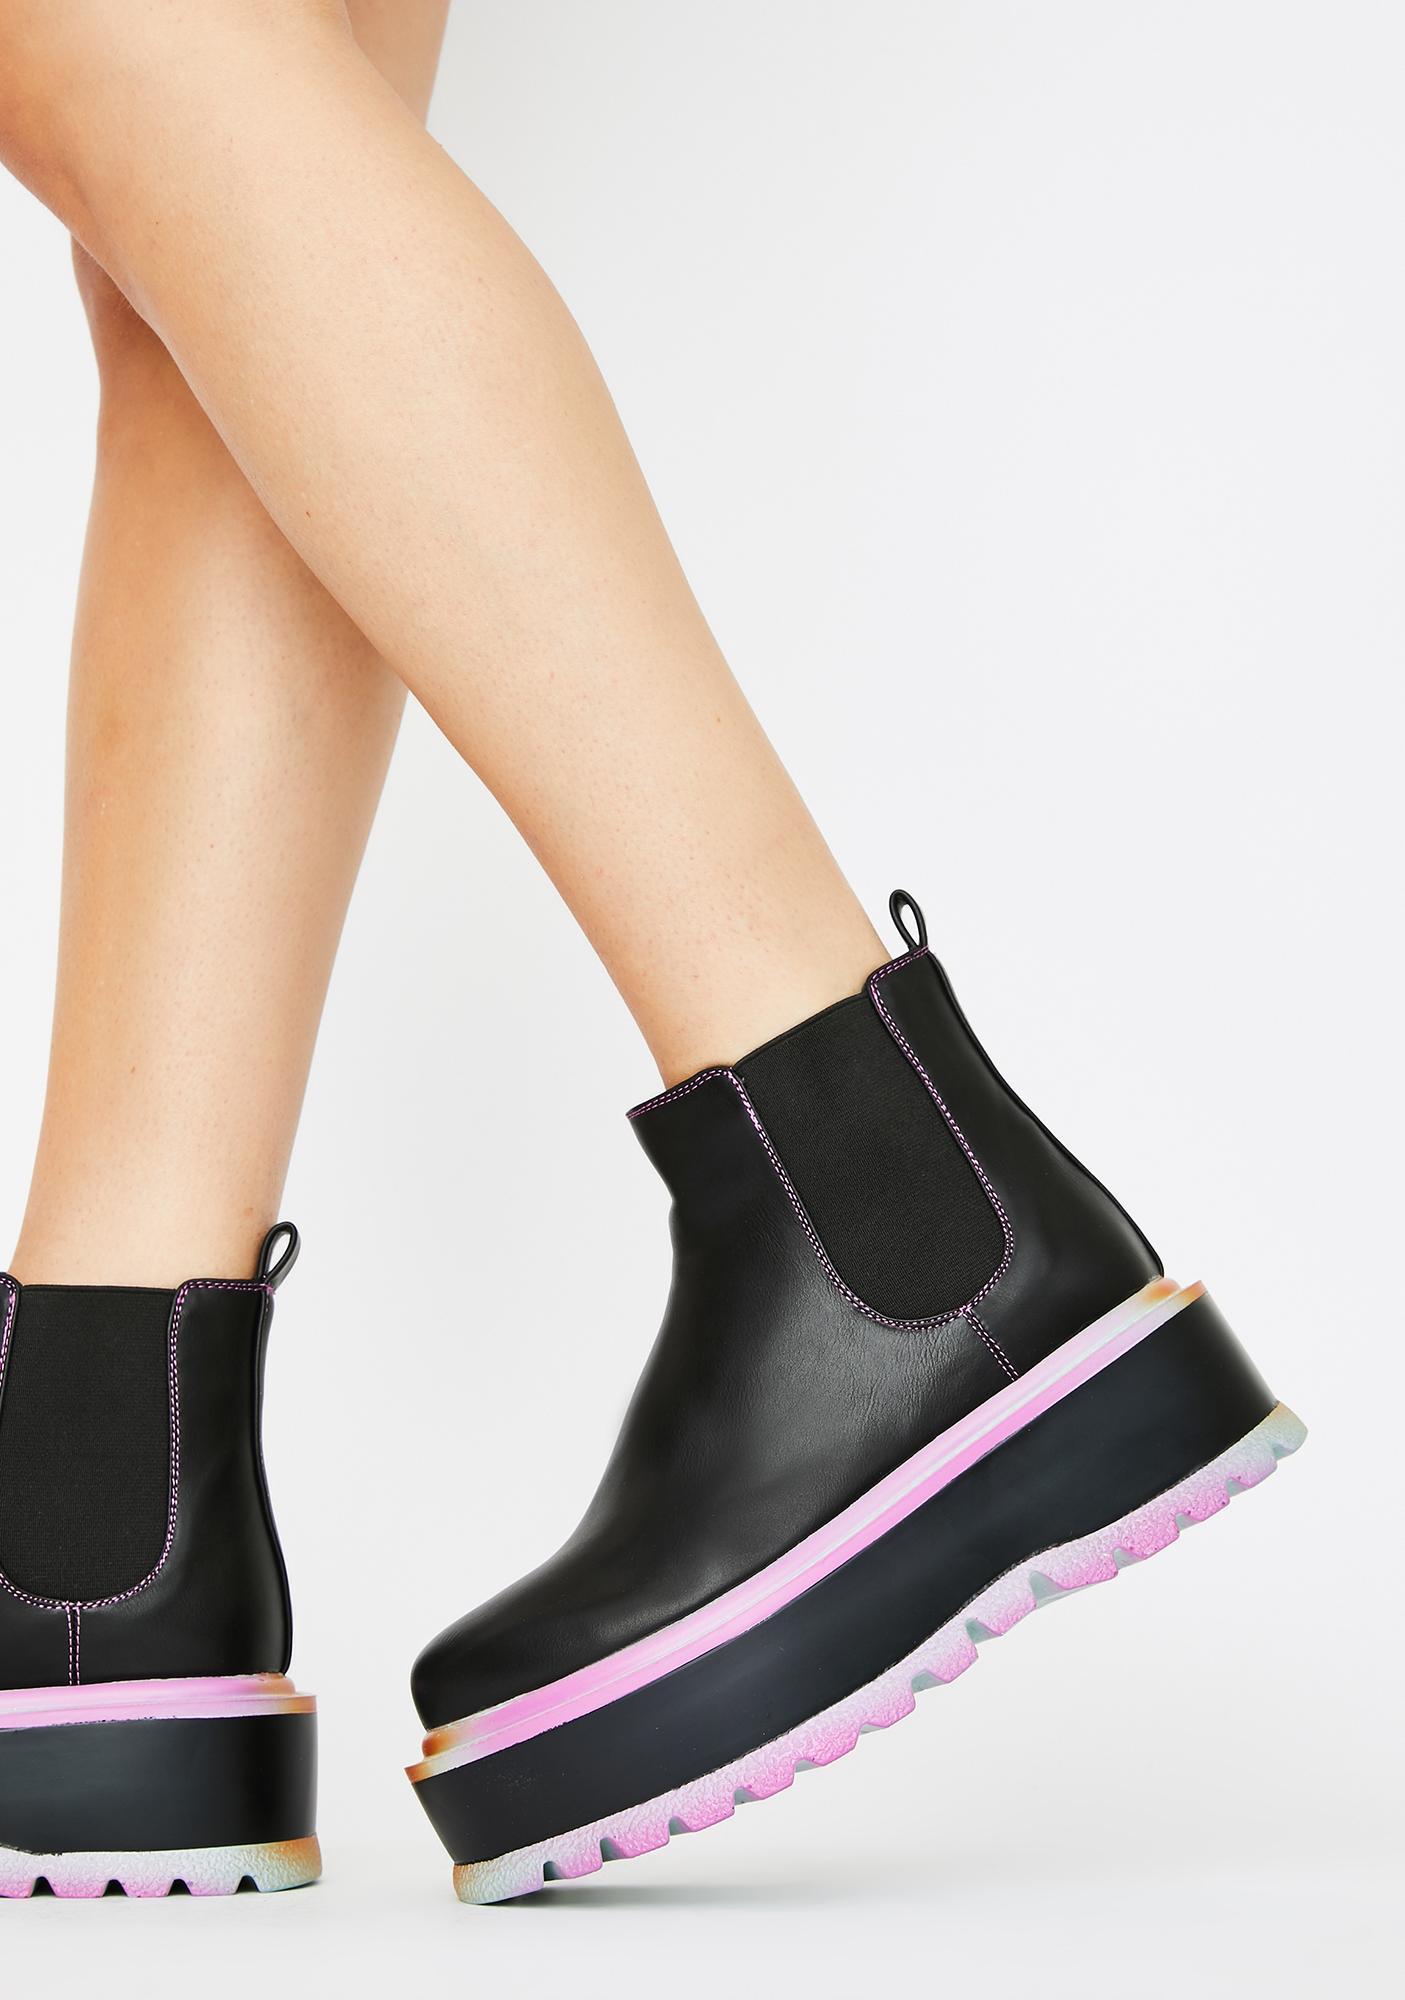 Koi Footwear Raum Chelsea Platform Boots